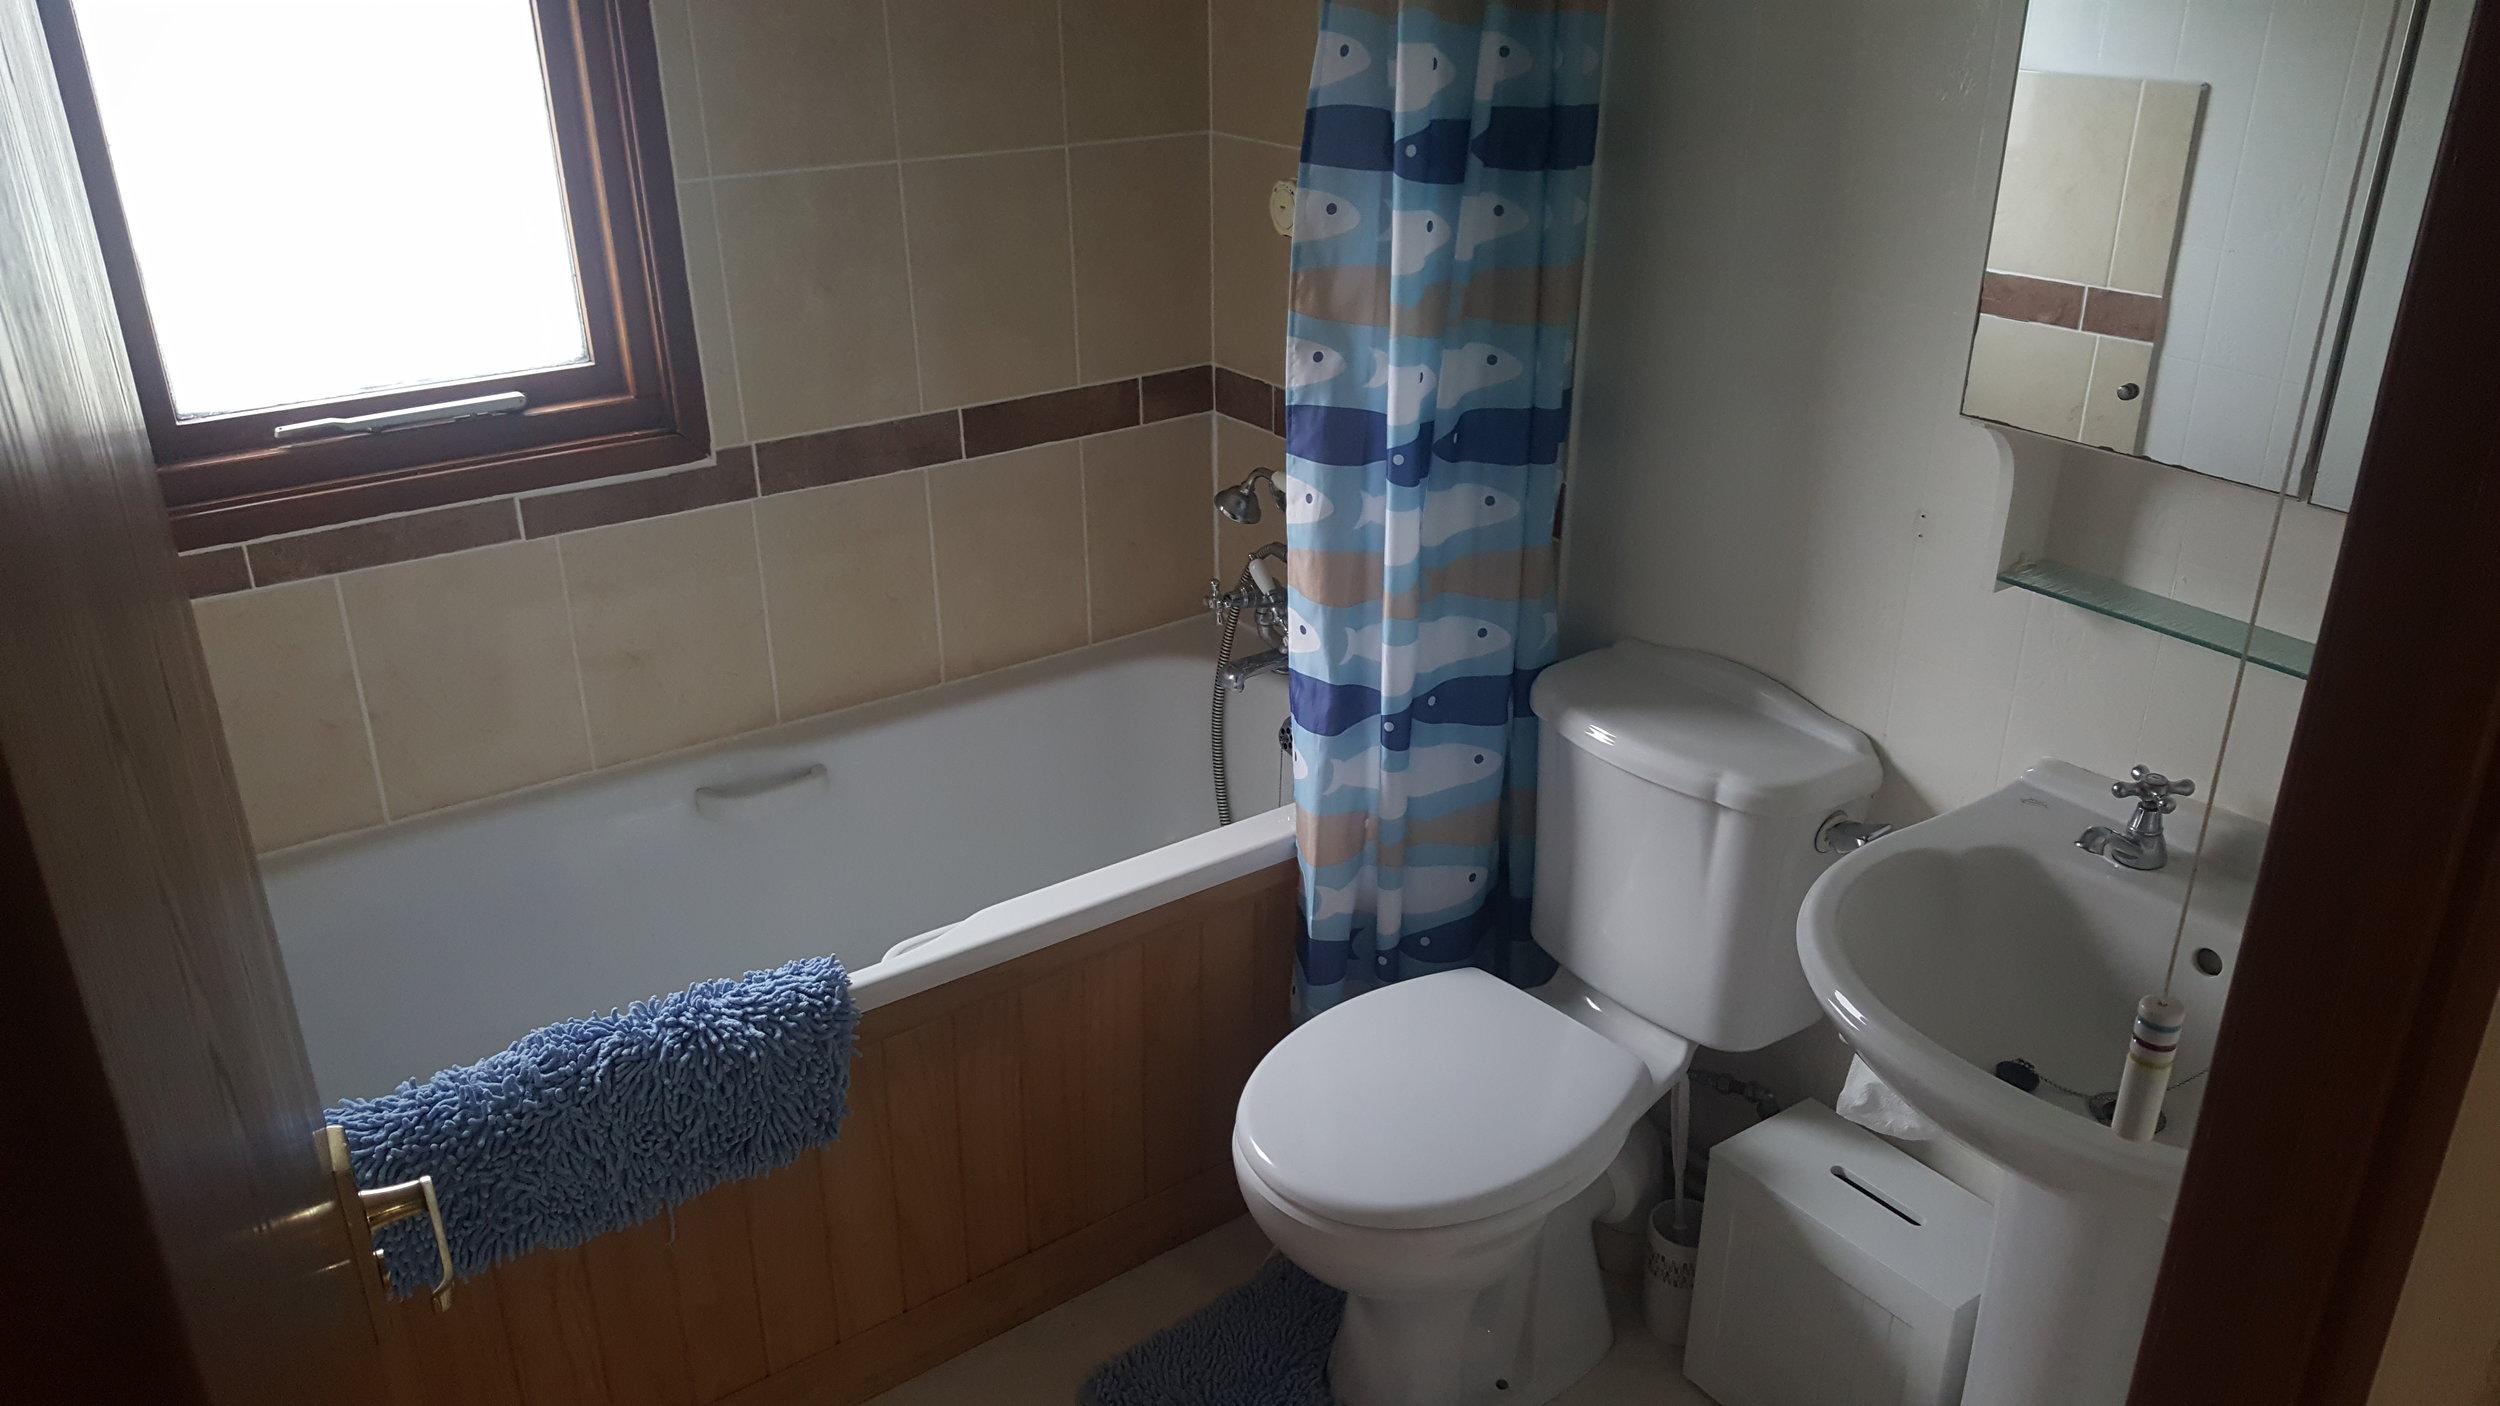 Bathroom - Lodge Lorton Vale Caravans lortonvalecaravans.co.uk